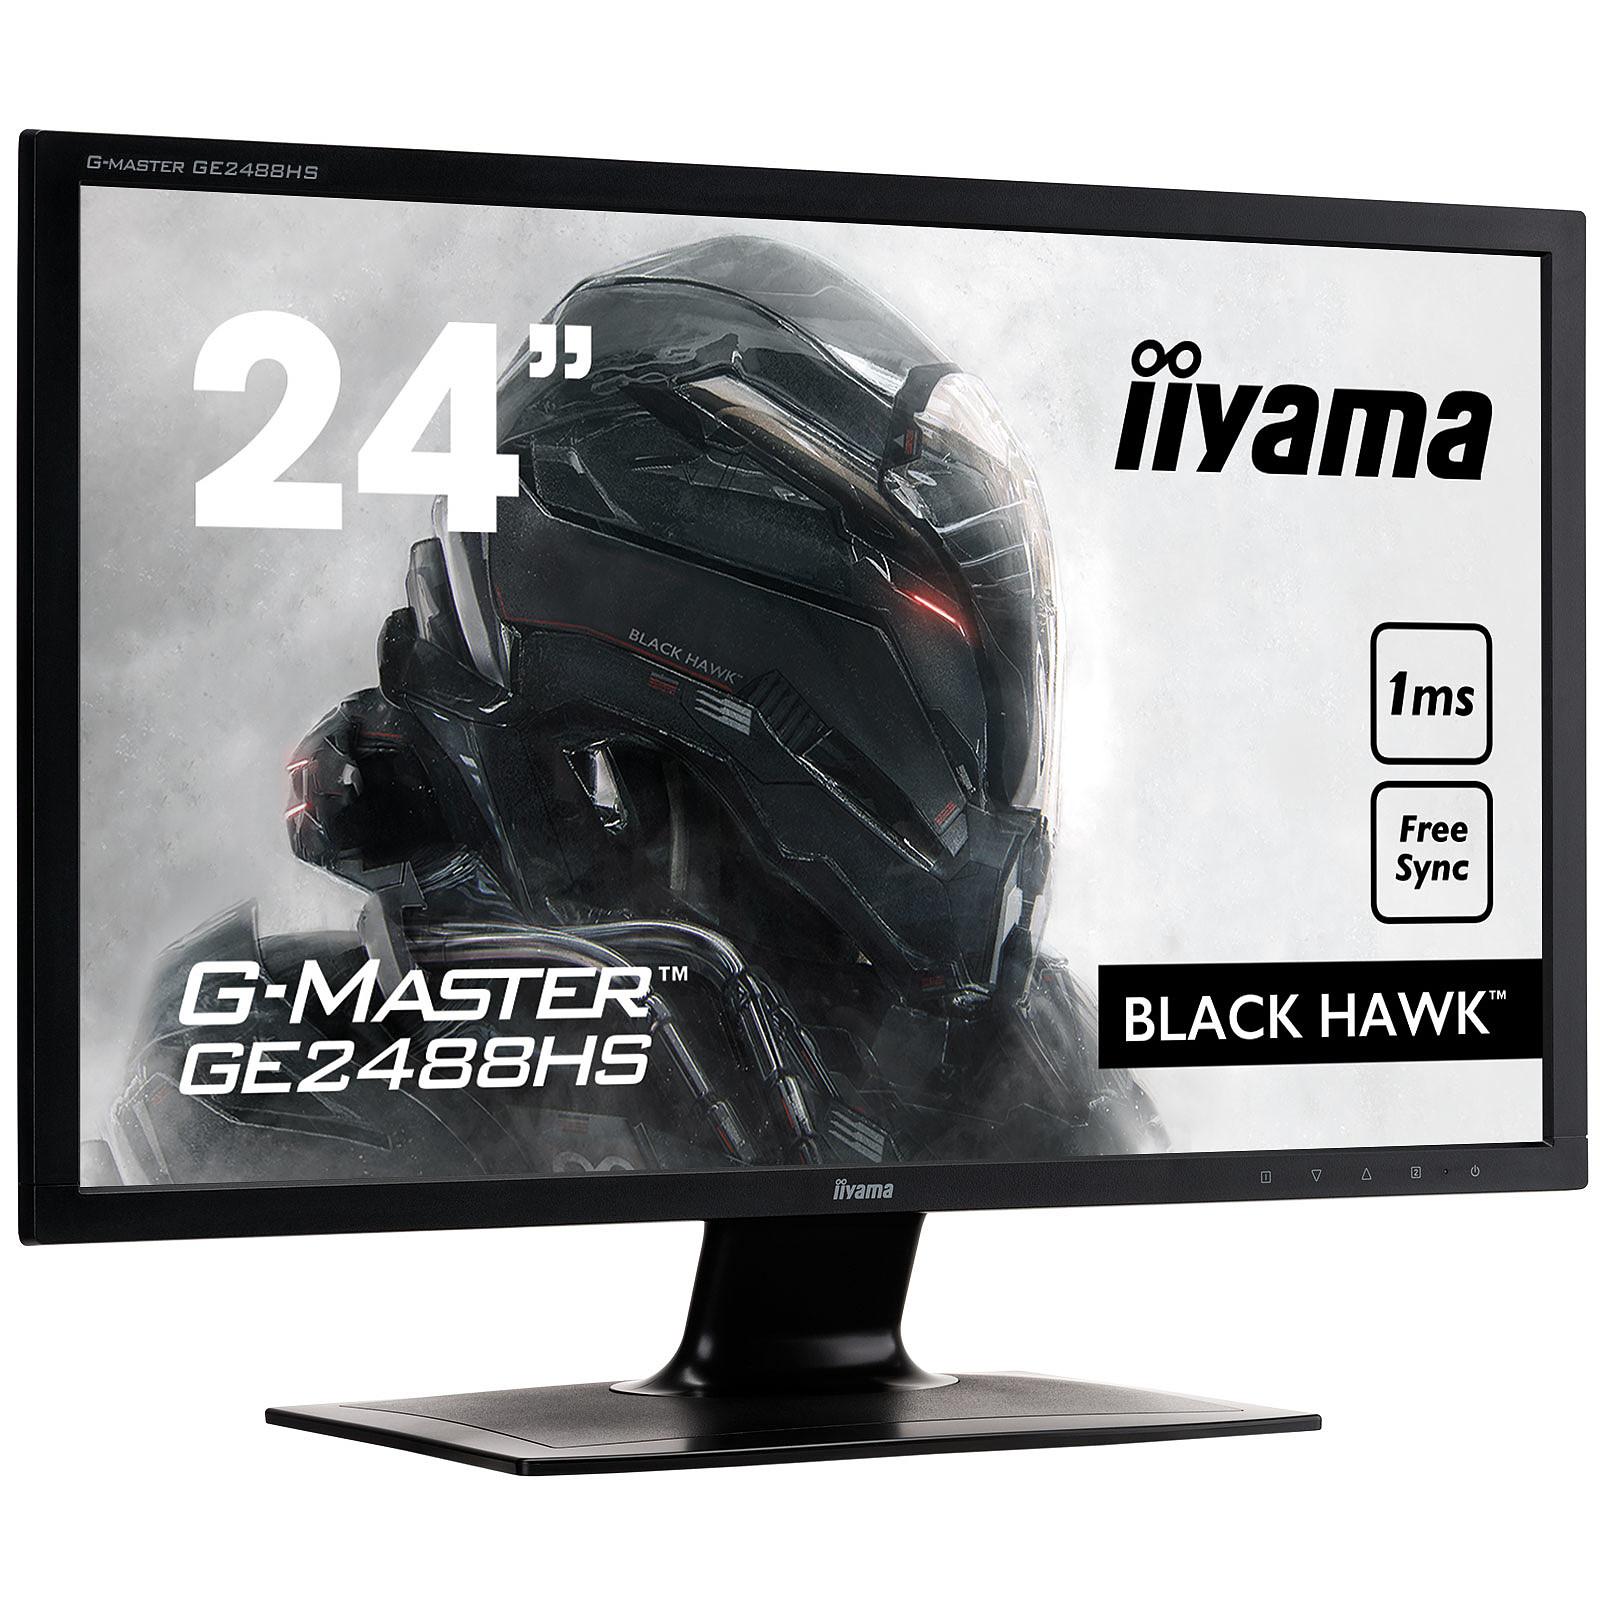 "iiyama 24"" LED - G-MASTER GE2488HS-B2 Black Hawk"